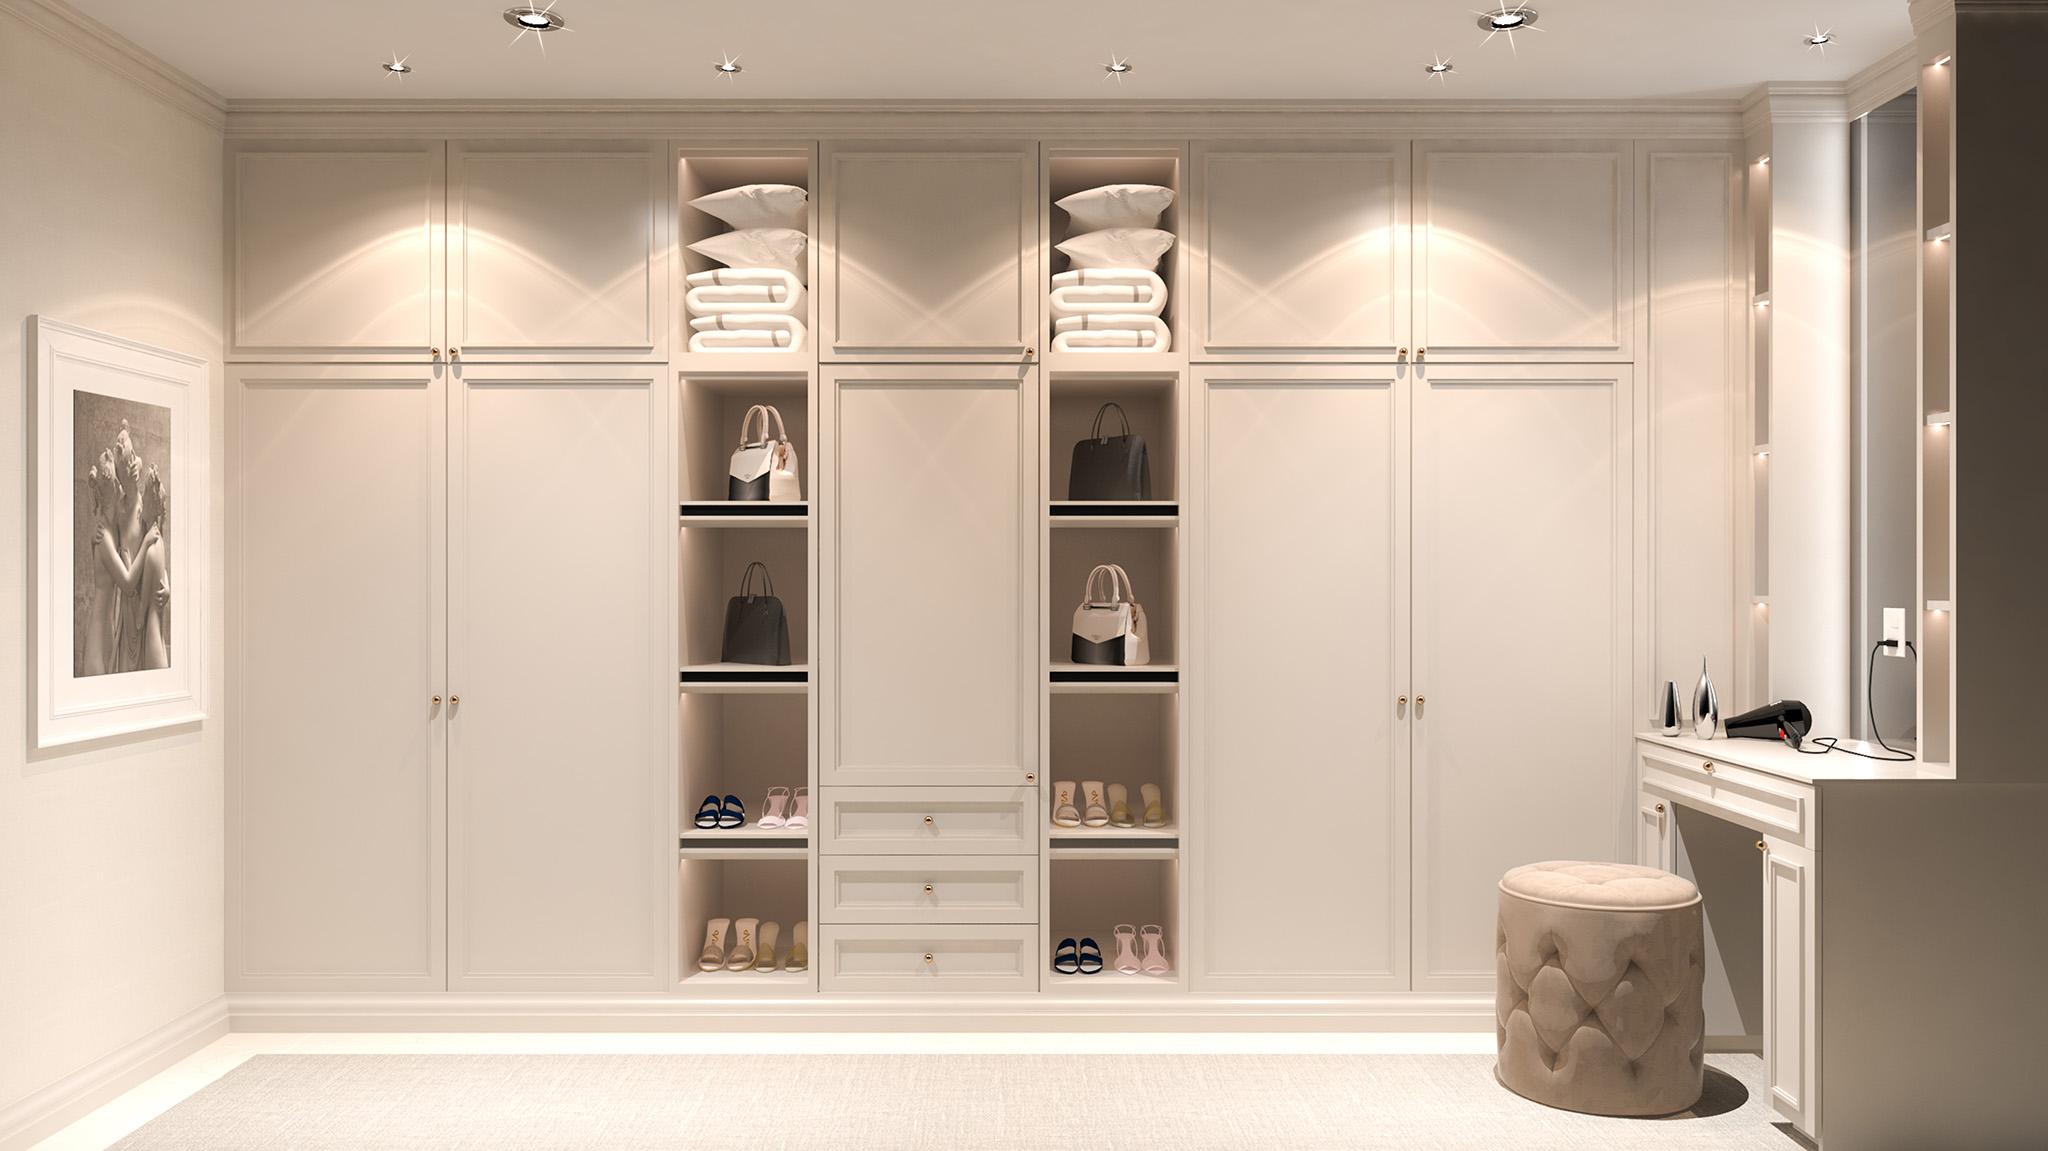 fitted bespoke wardrobes, shaker wardrobe door, wardrobe drawers